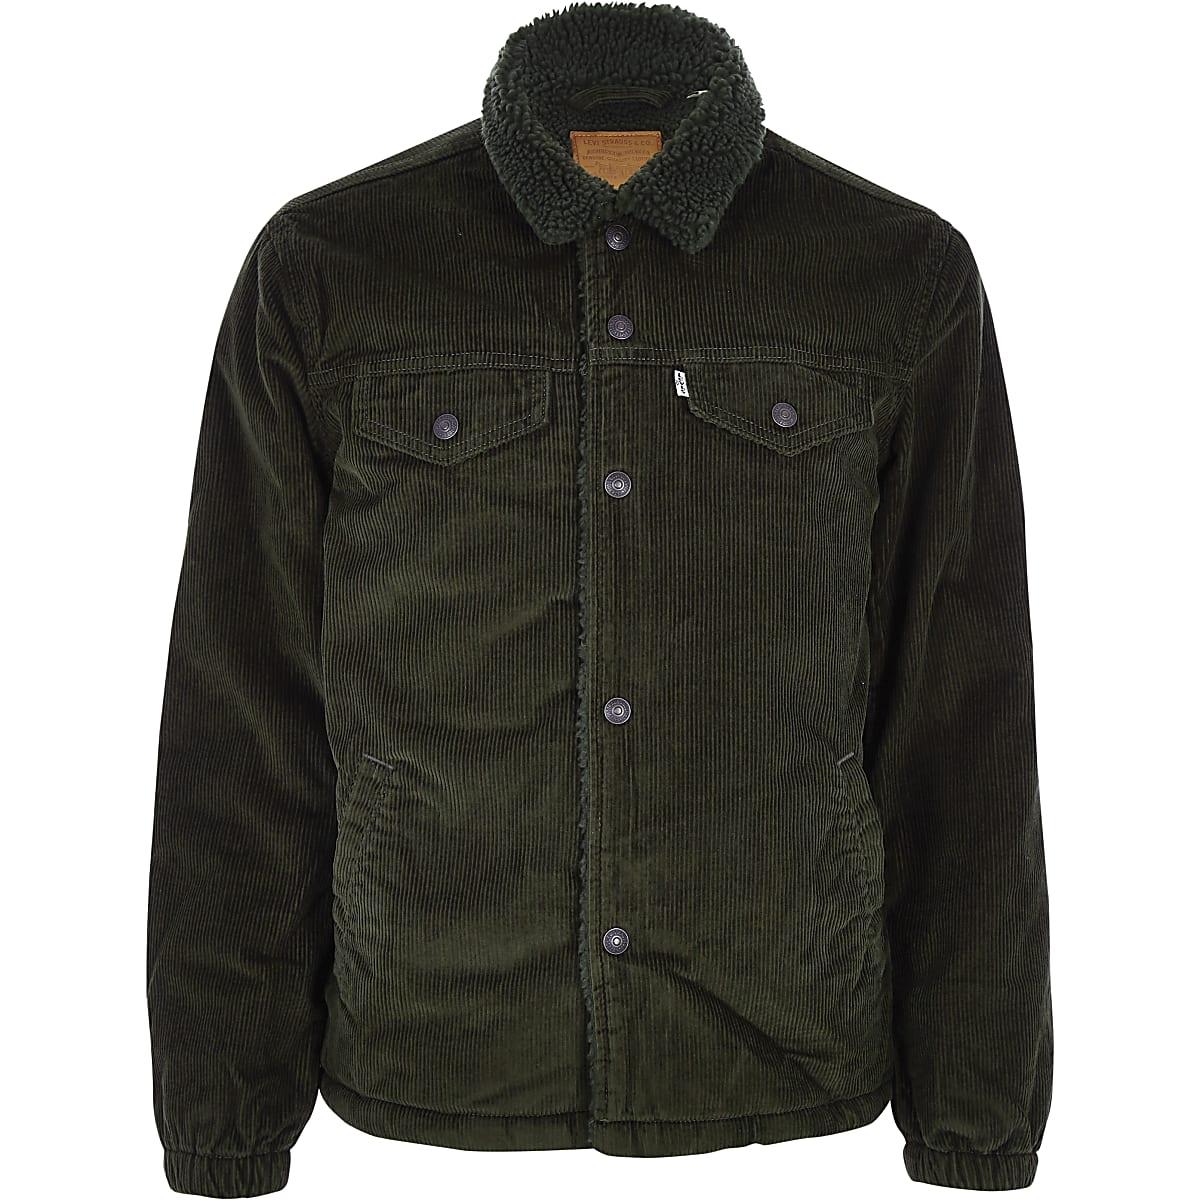 8198e249a8da Levi's khaki cord trucker jacket - Jackets - Coats & Jackets - men